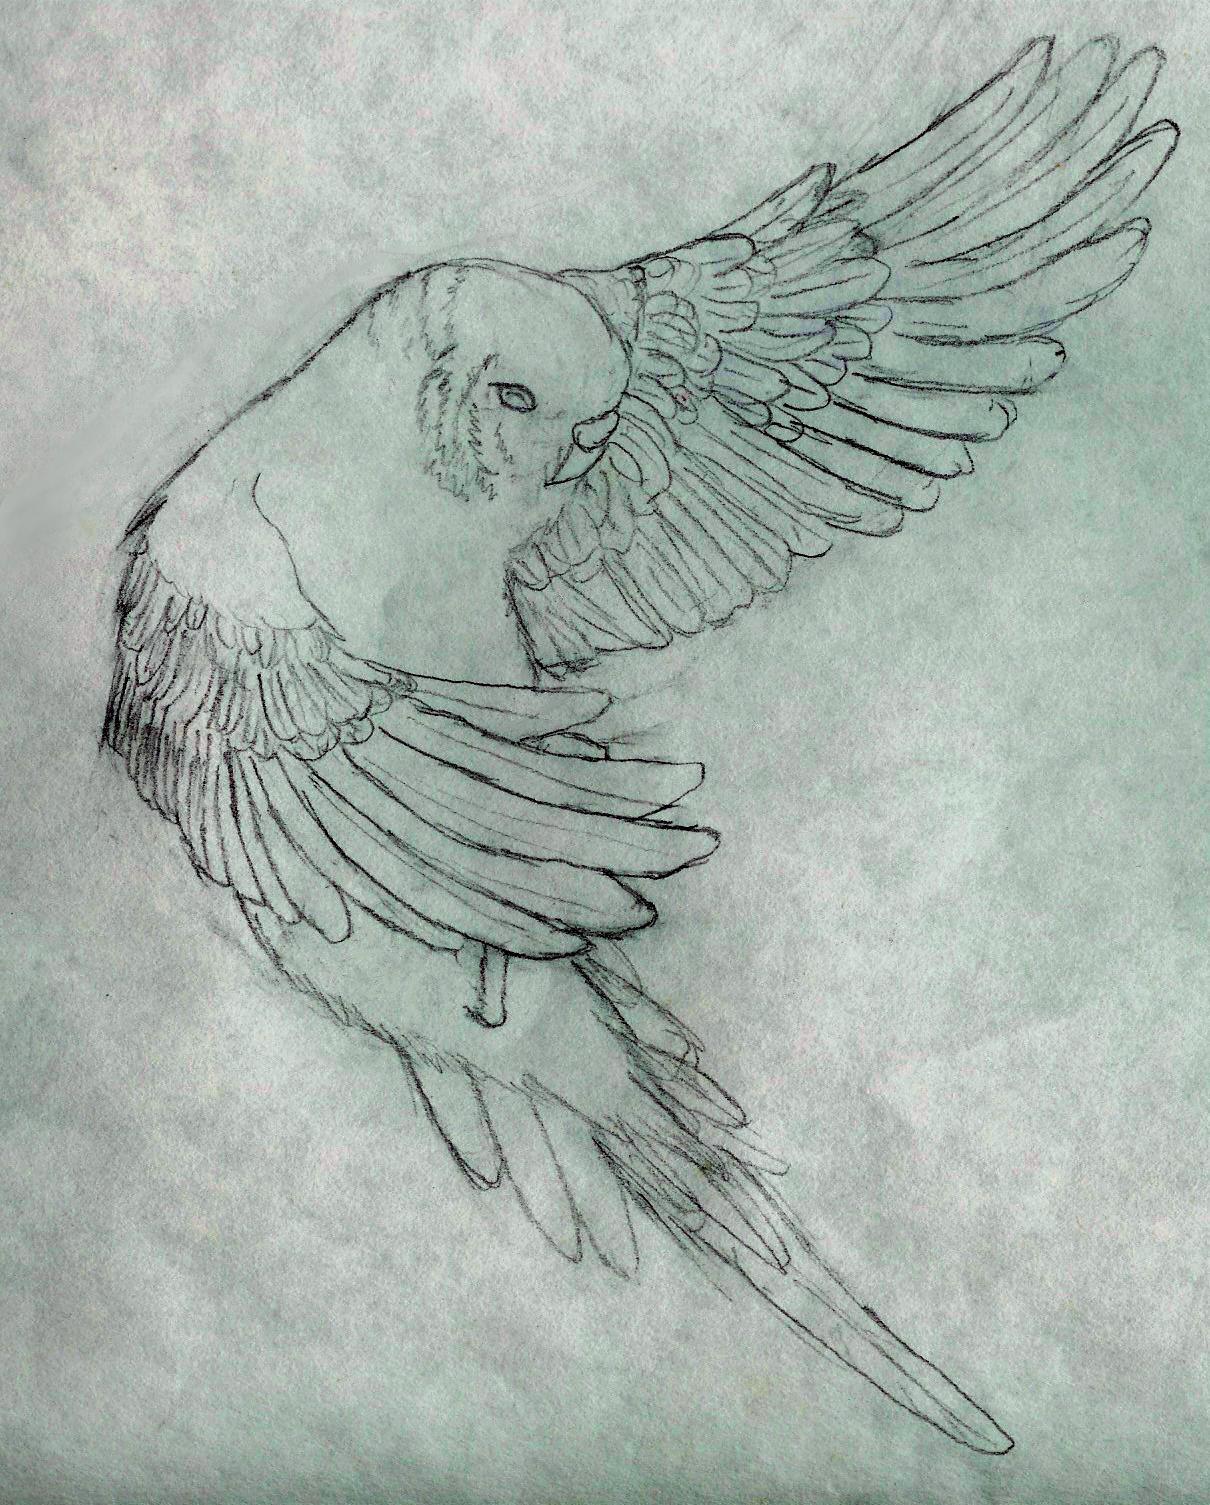 Drawn parakeet tattoos Glinadaro Glinadaro Flying by Flying